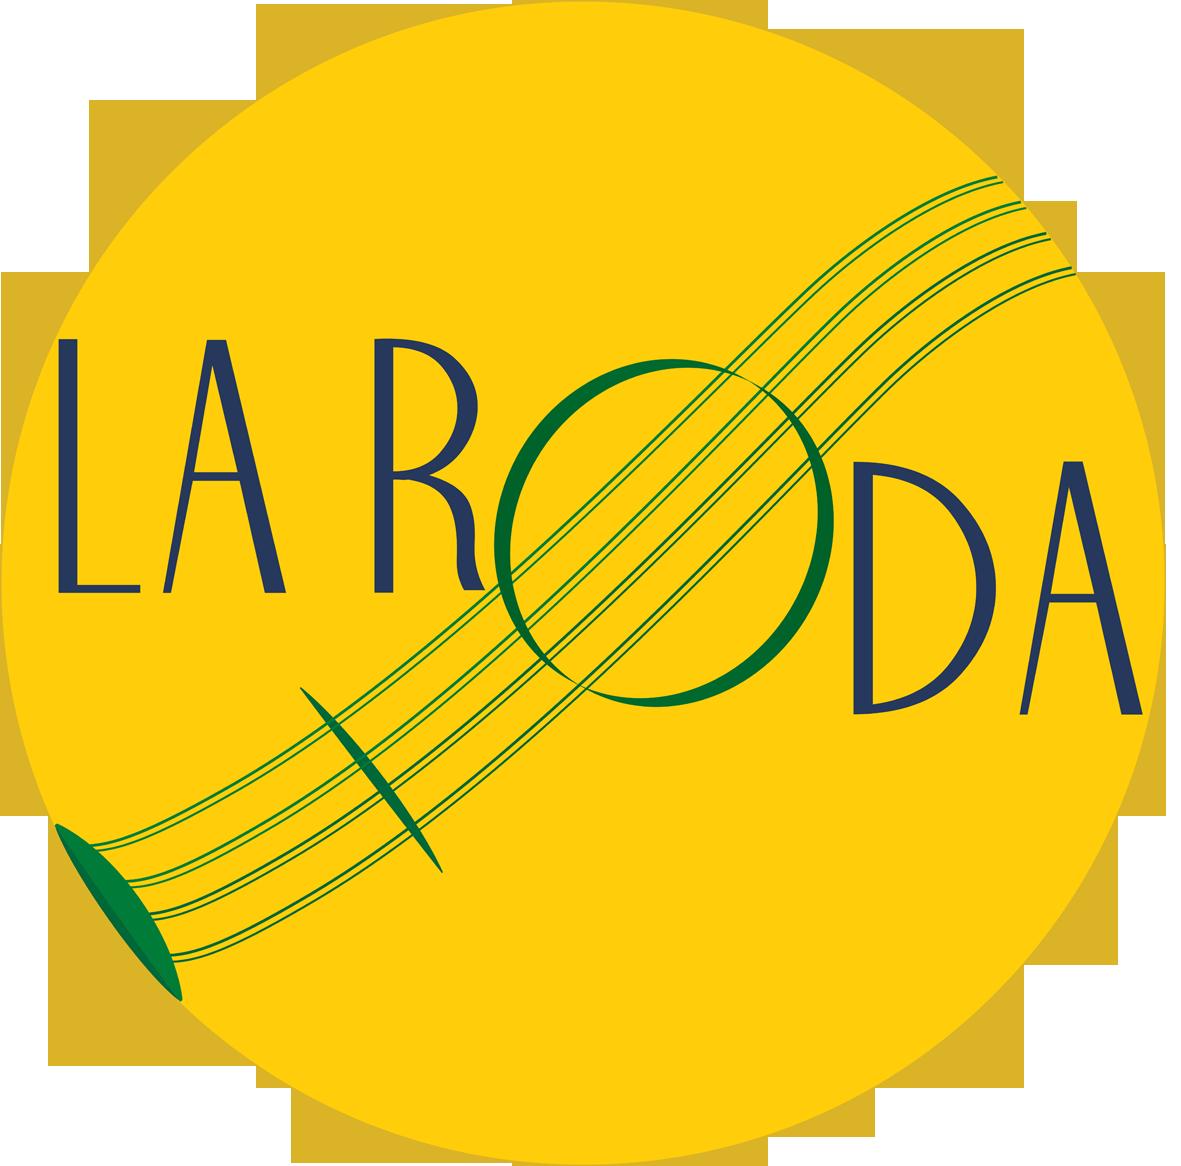 logo_laroda_100x100_300dpi